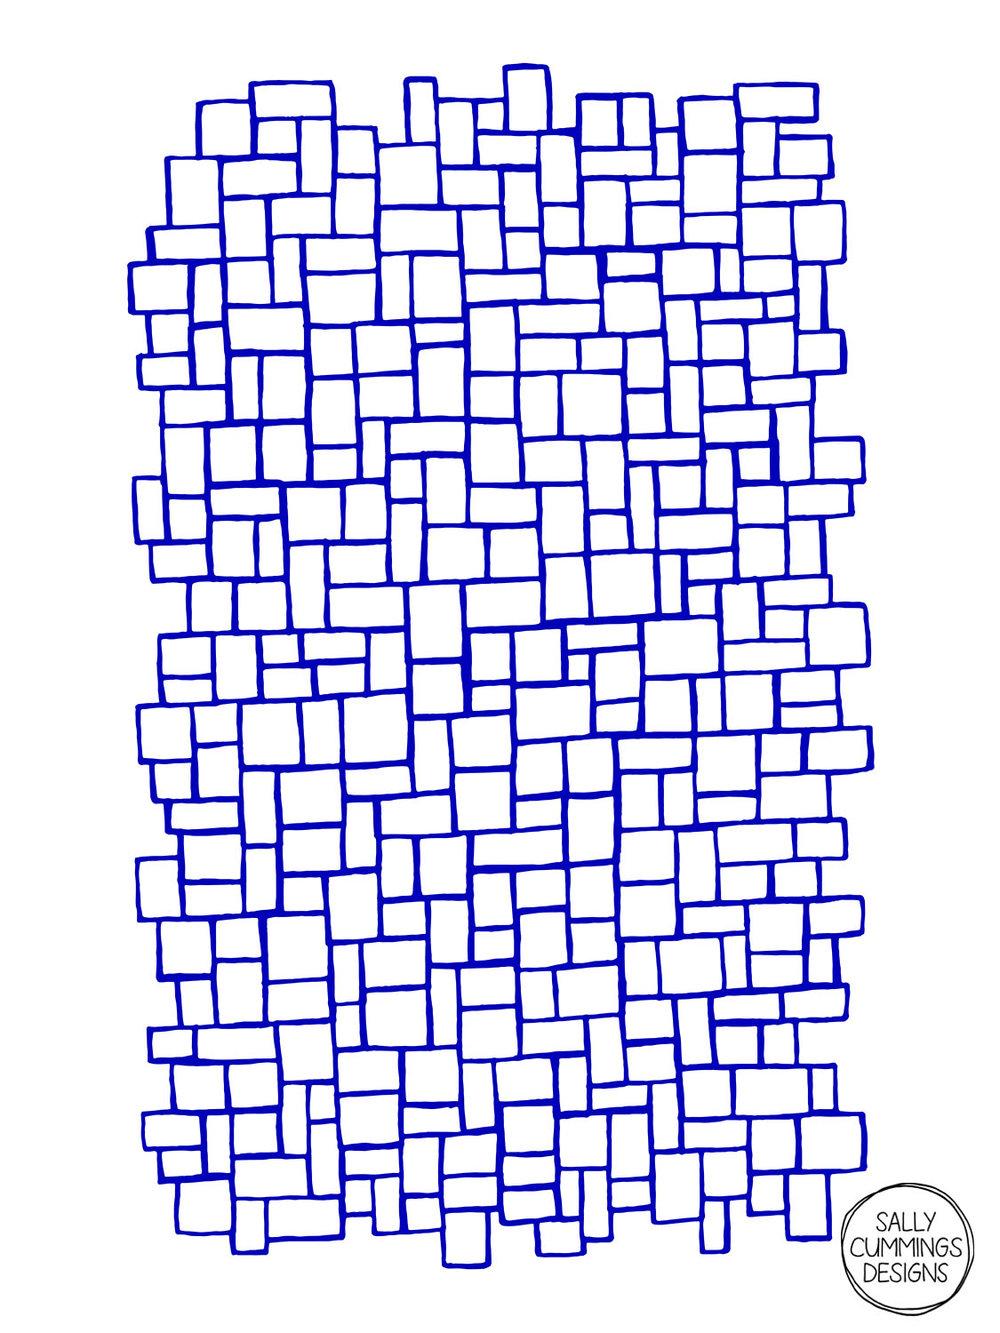 Sally Cummings Designs - Blue Blocks